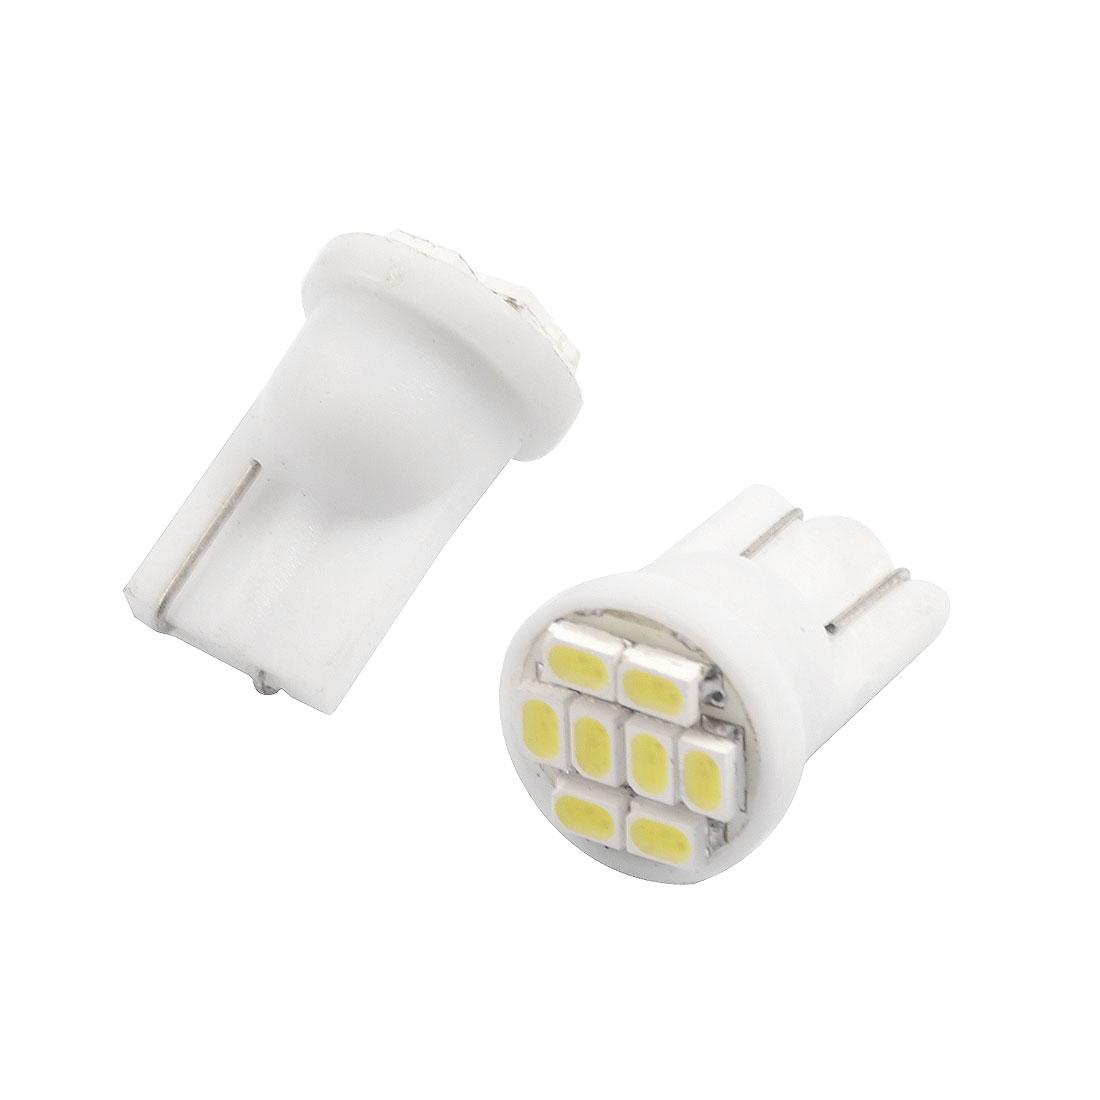 2 Pcs T10 8 SMD 1206 LED Car White Lamp Side Wedge Light Bulbs